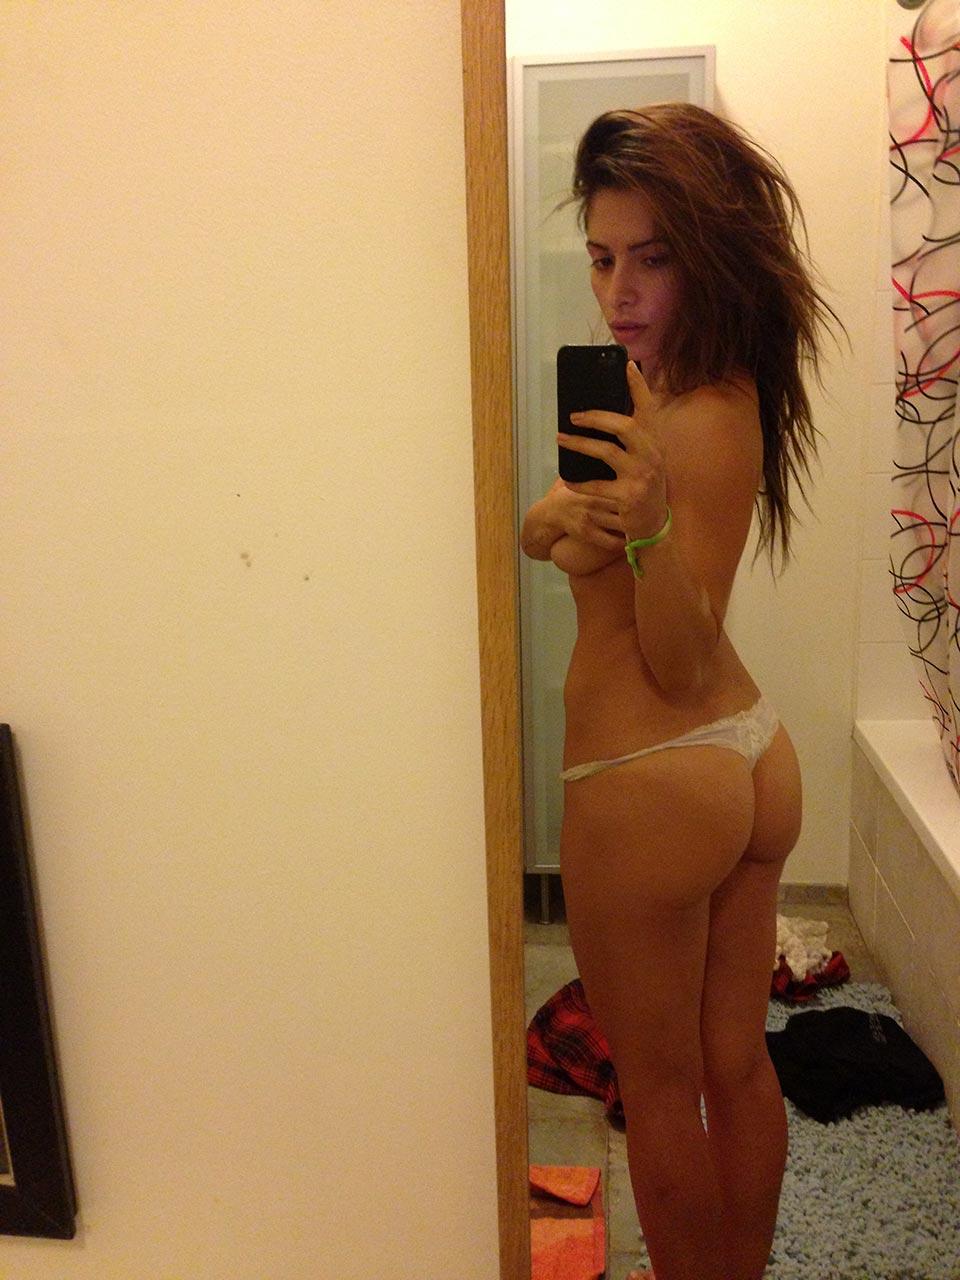 Erotic Photos Australian party girls naked